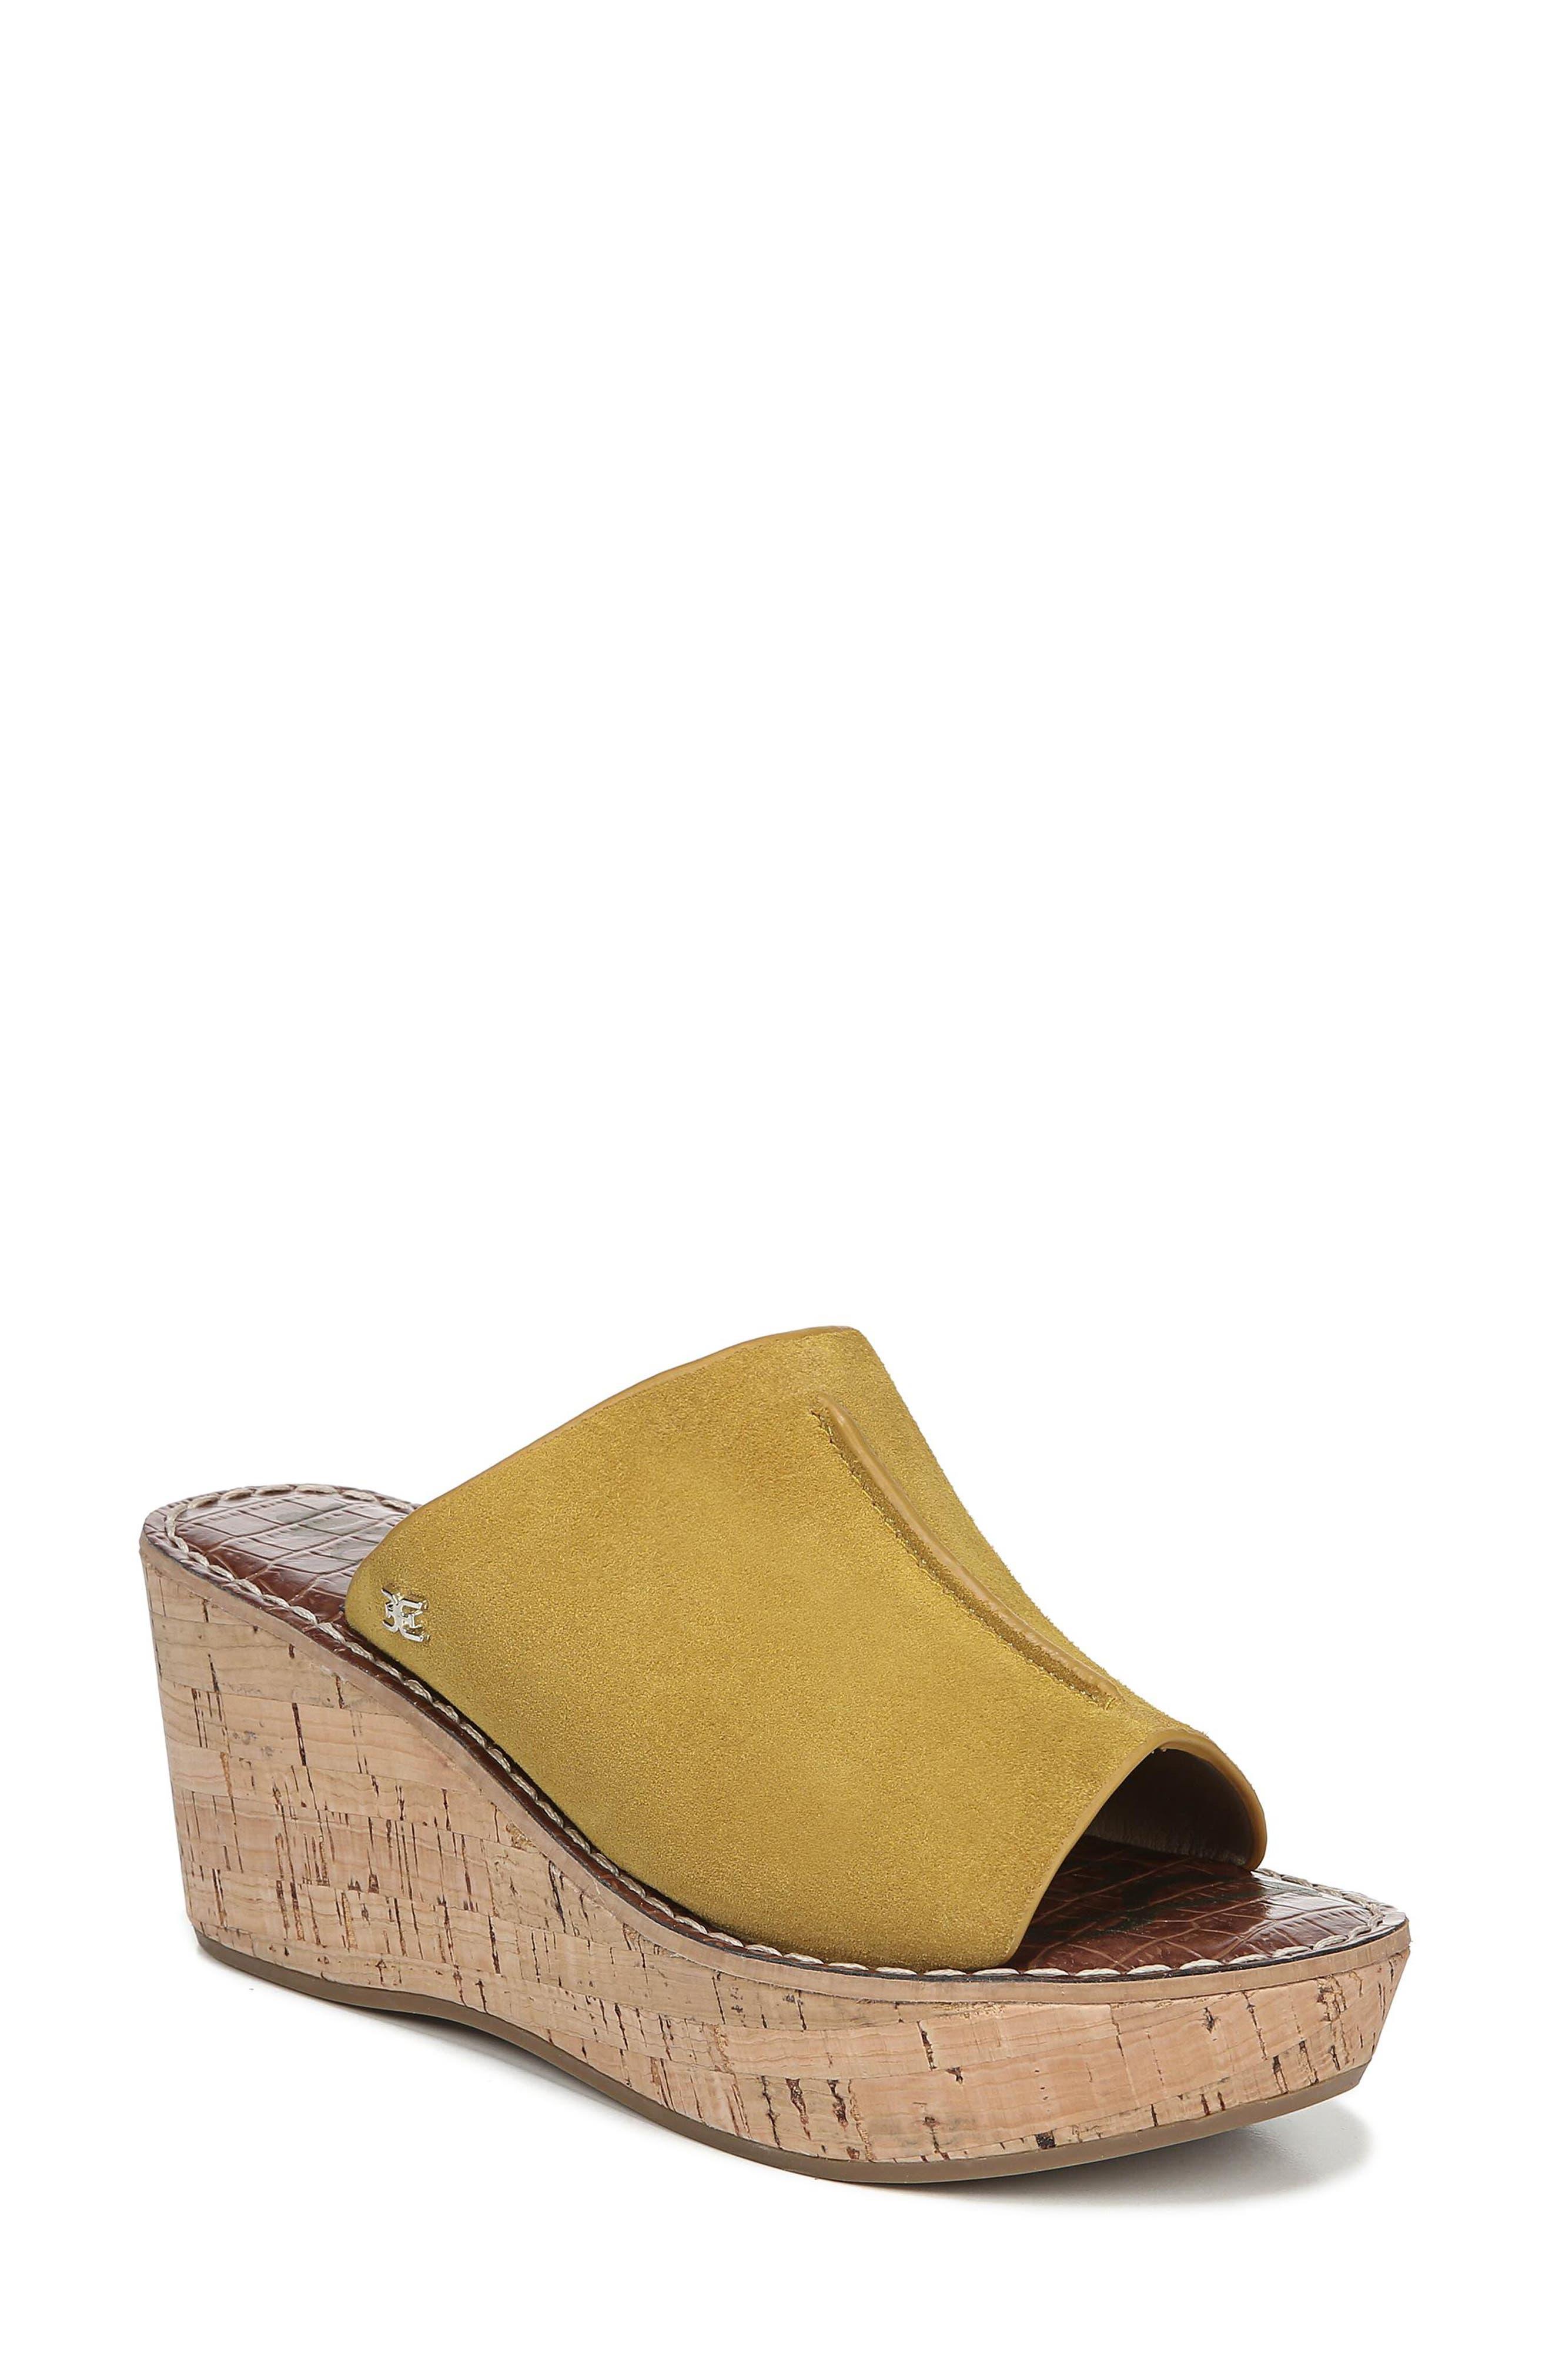 Sam Edelman Ranger Platform Sandal, Yellow